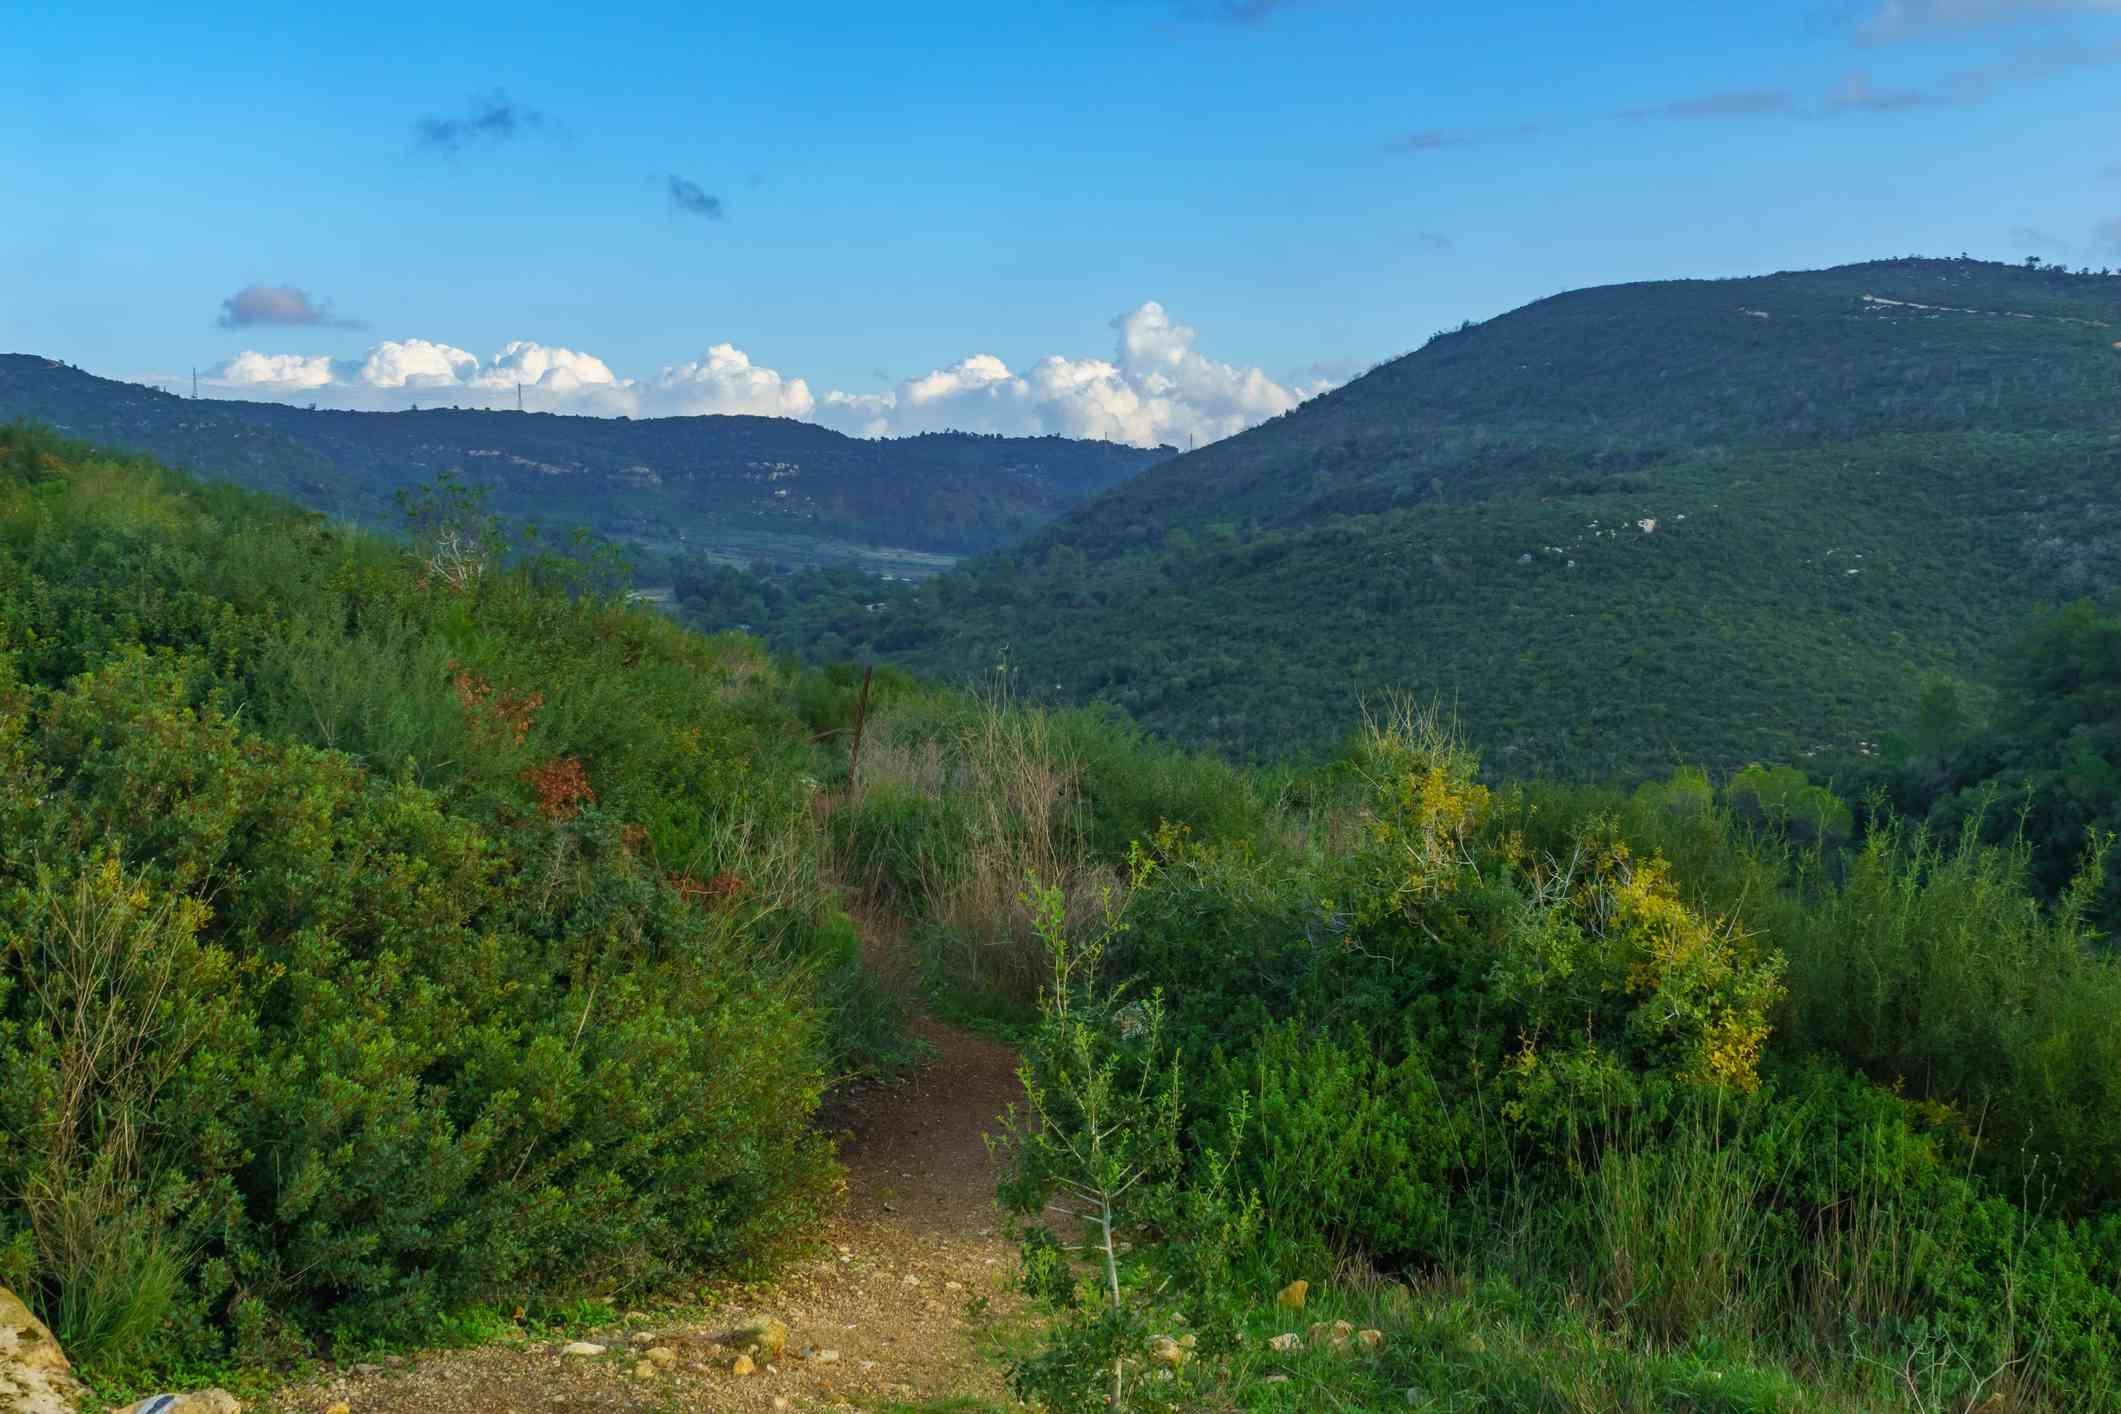 Mount Carmel, Israel